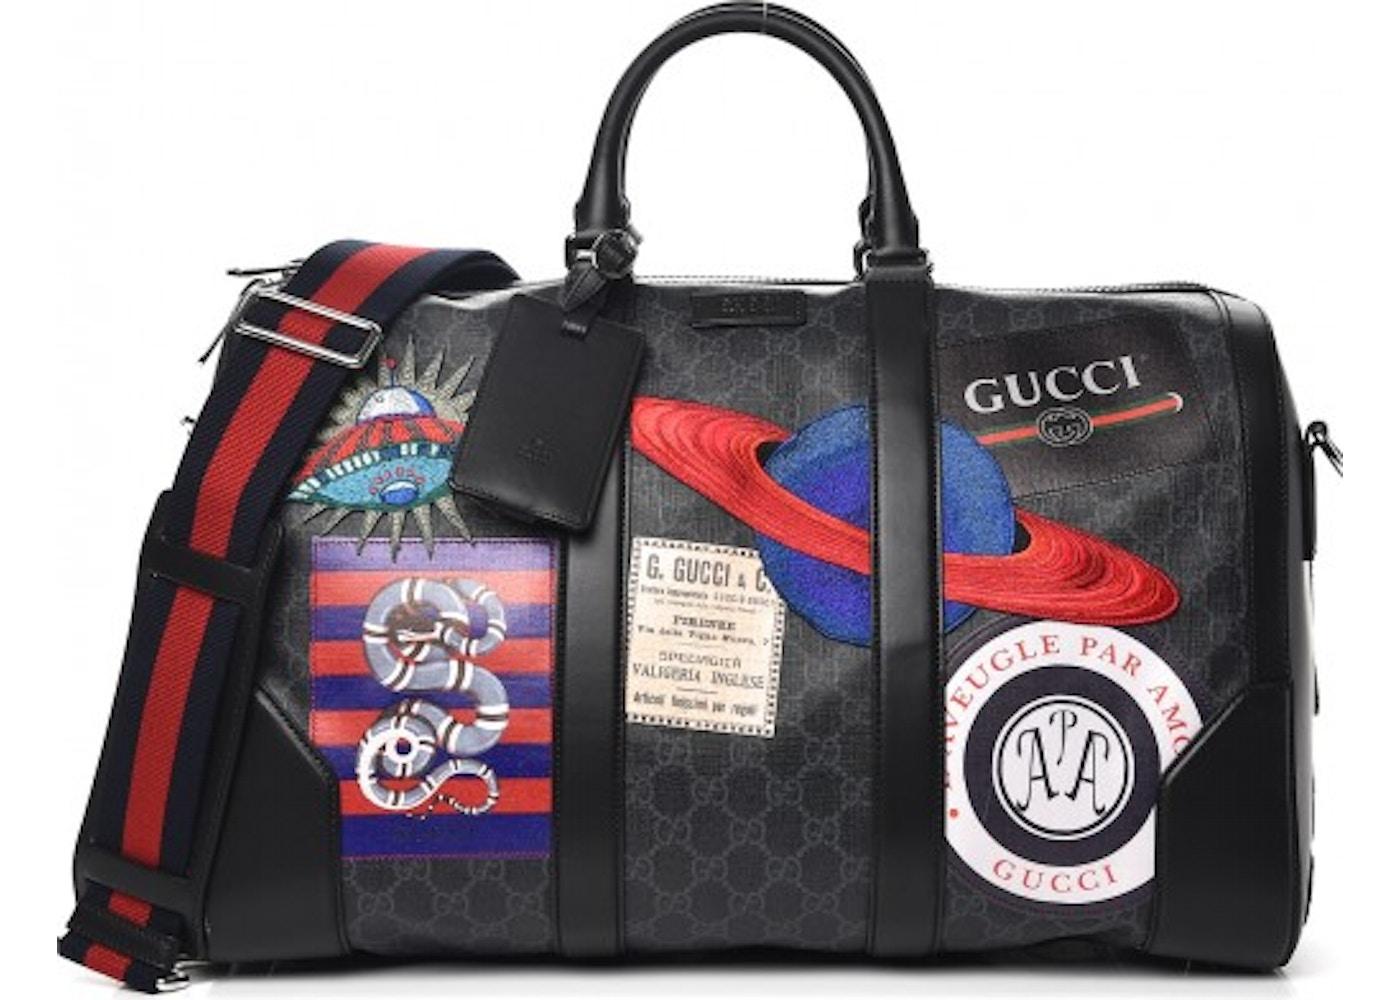 71ca6fdacc1 Gucci Carry On Duffle Monogram GG Supreme Night Courrier Black